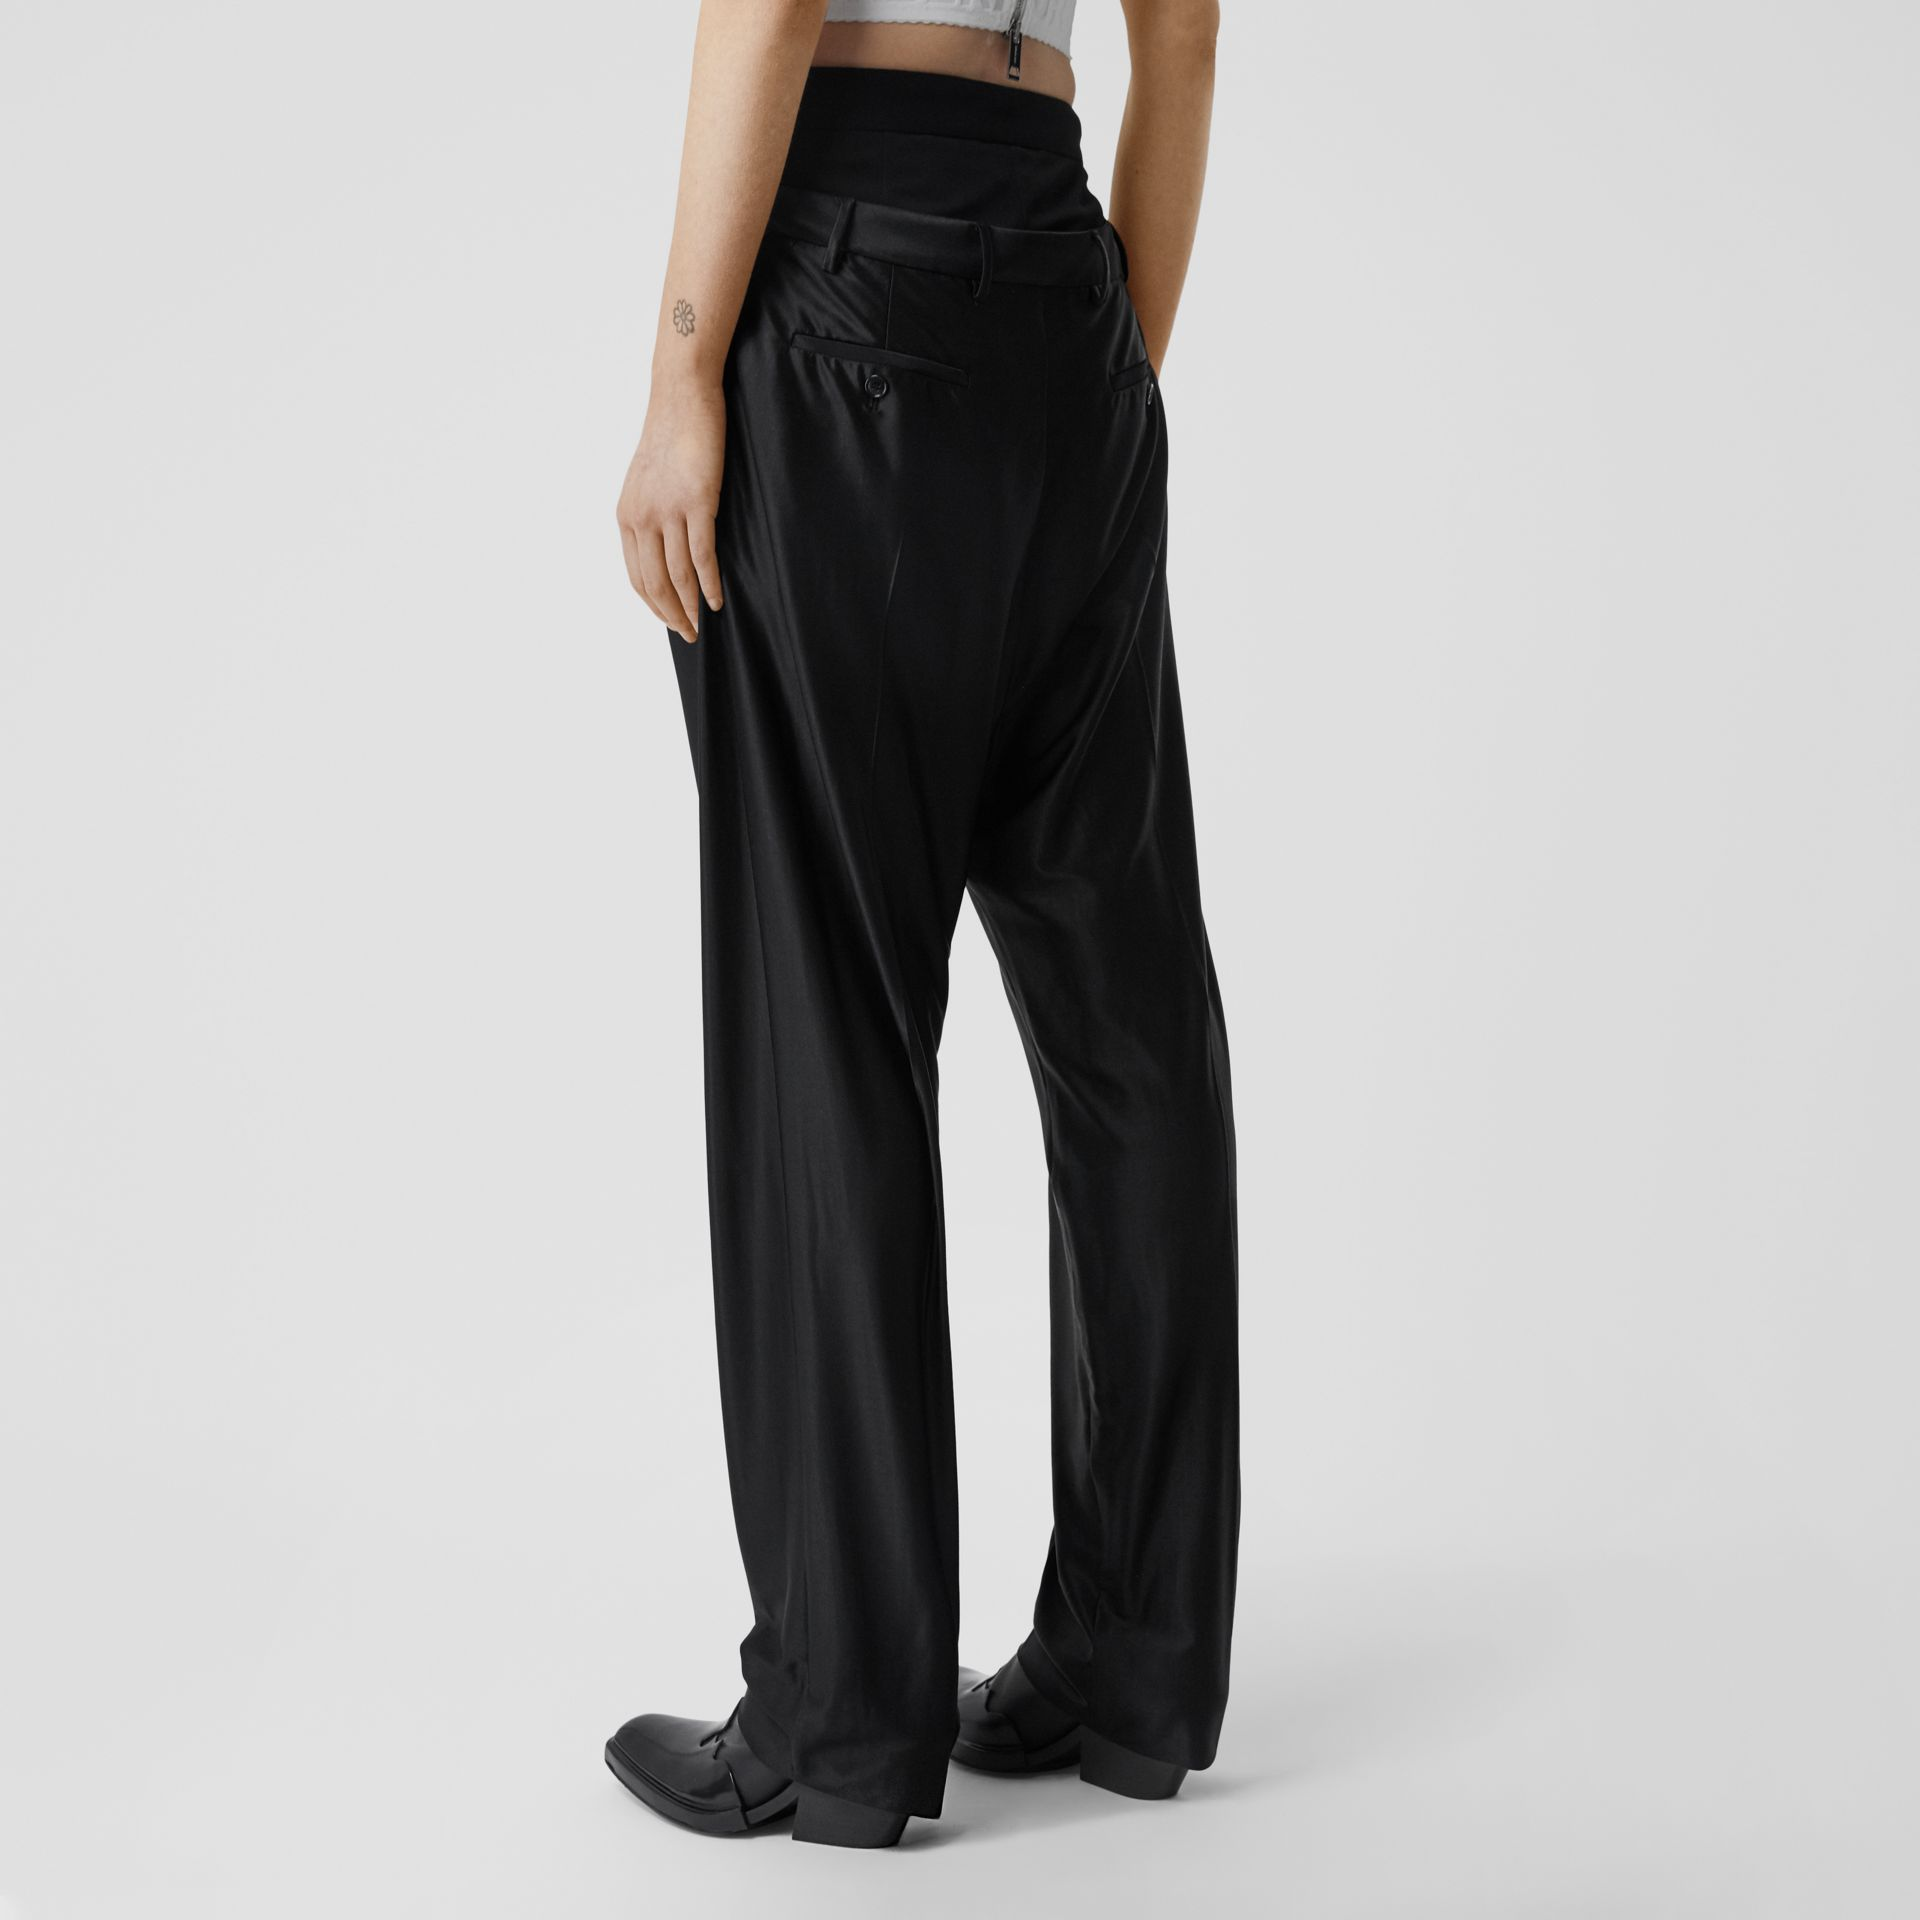 Double-waist Jersey Trousers in Black - Women | Burberry United Kingdom - gallery image 2